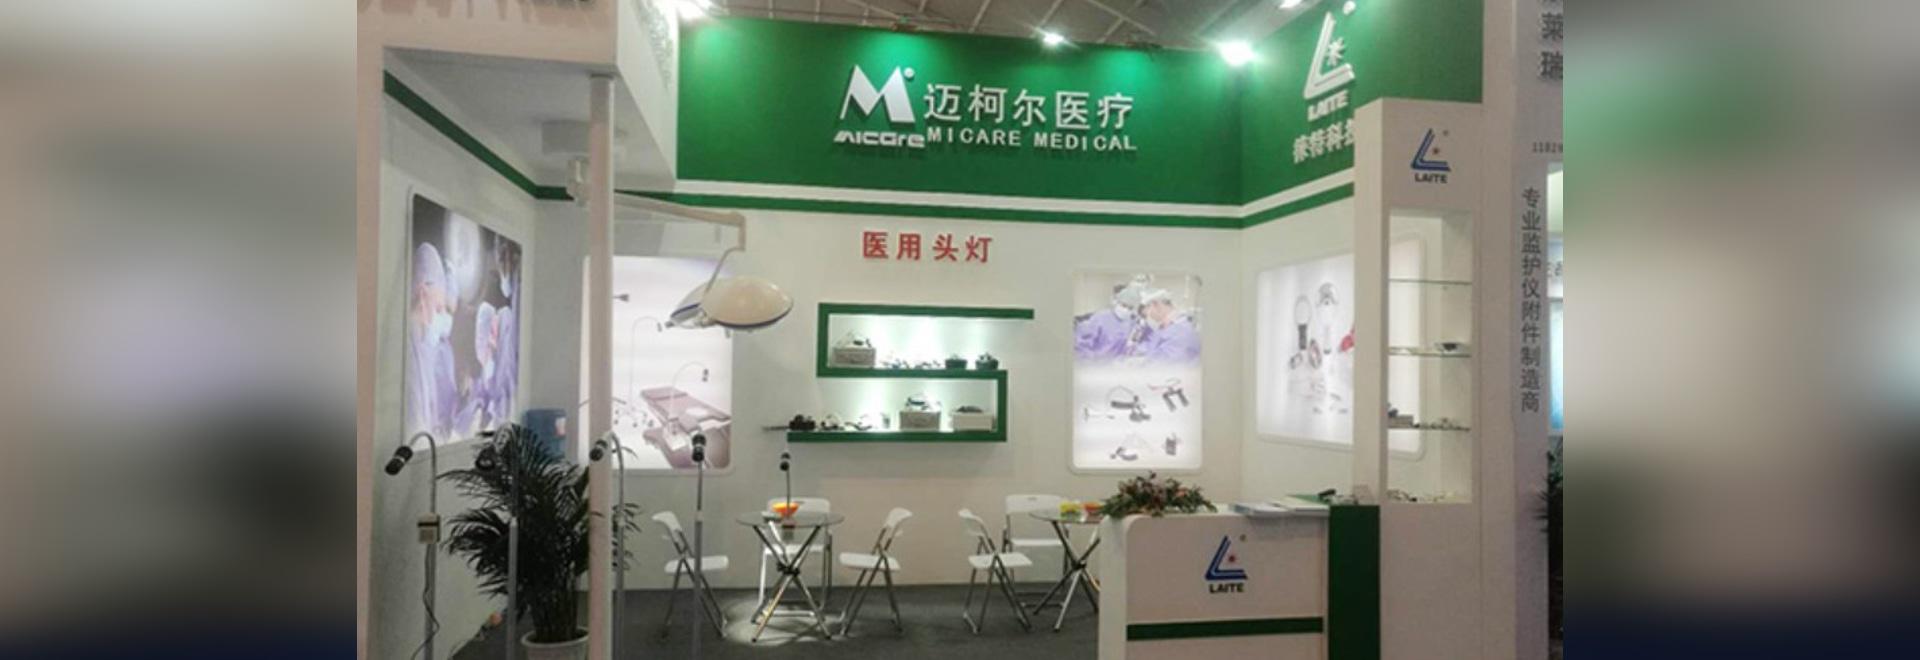 FCEM Chine 2017 kunming